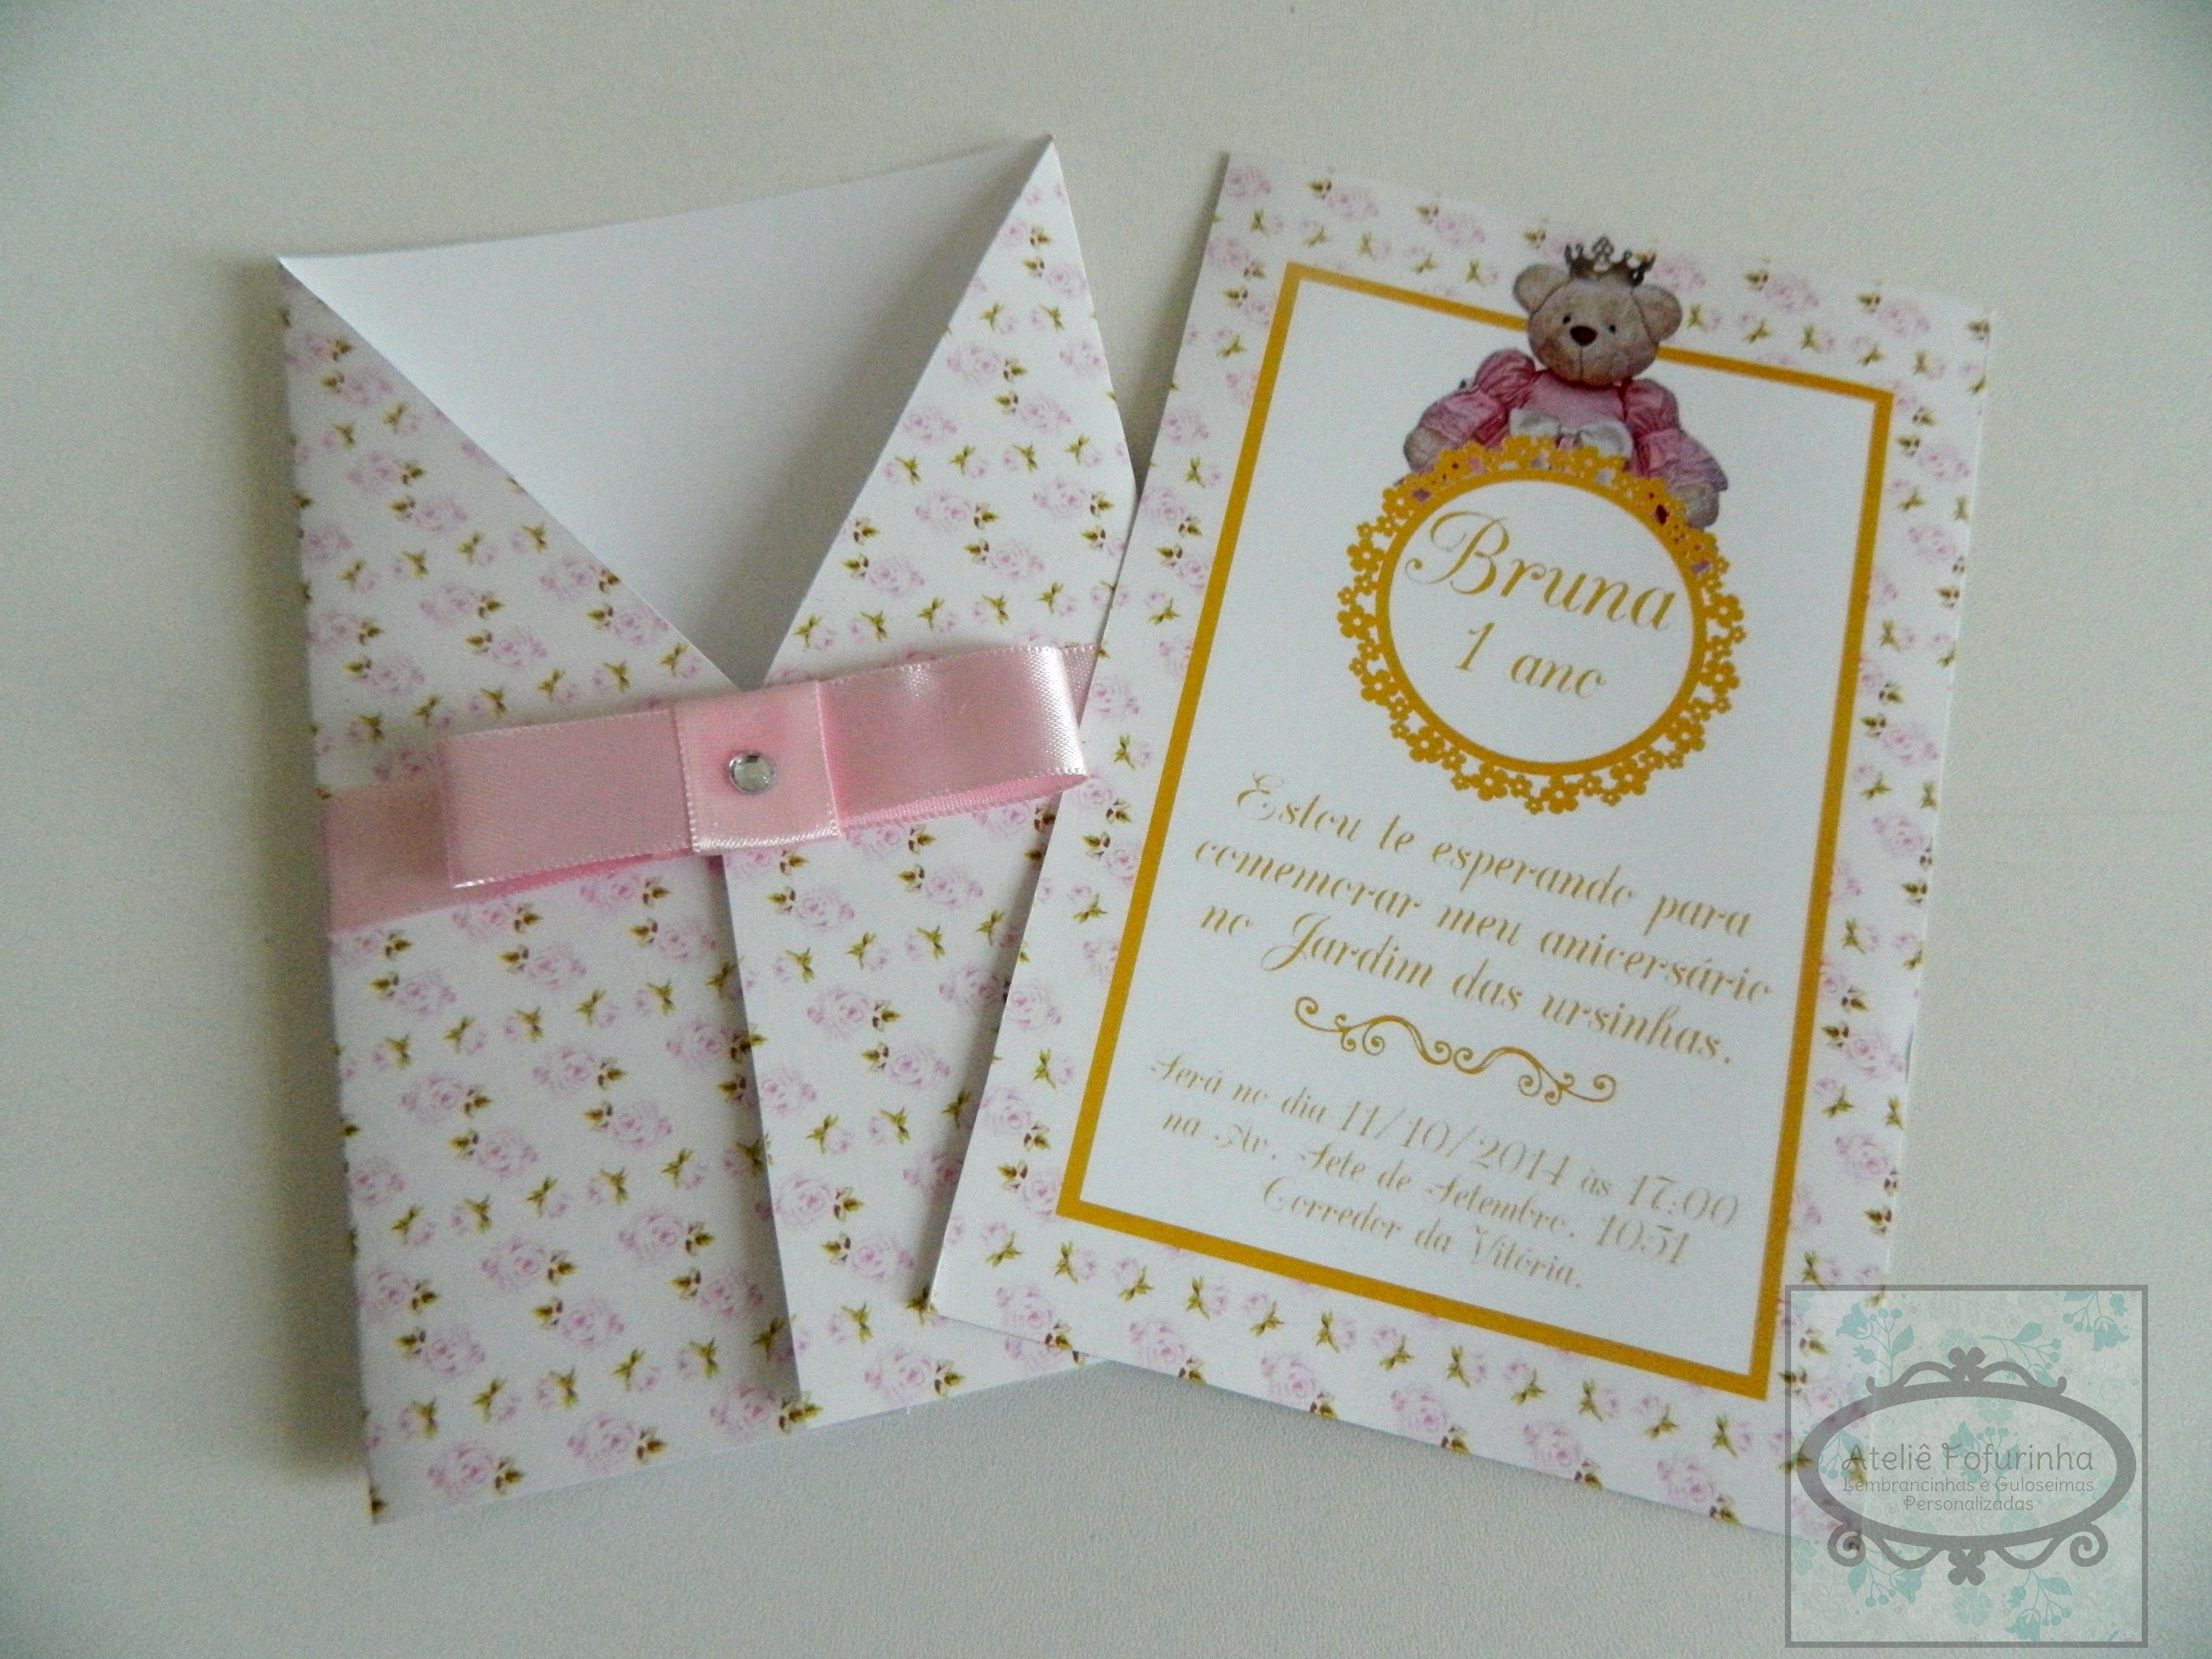 festa jardim convite : festa jardim convite:convite personalizado ursa princesa festa jardim convite personalizado